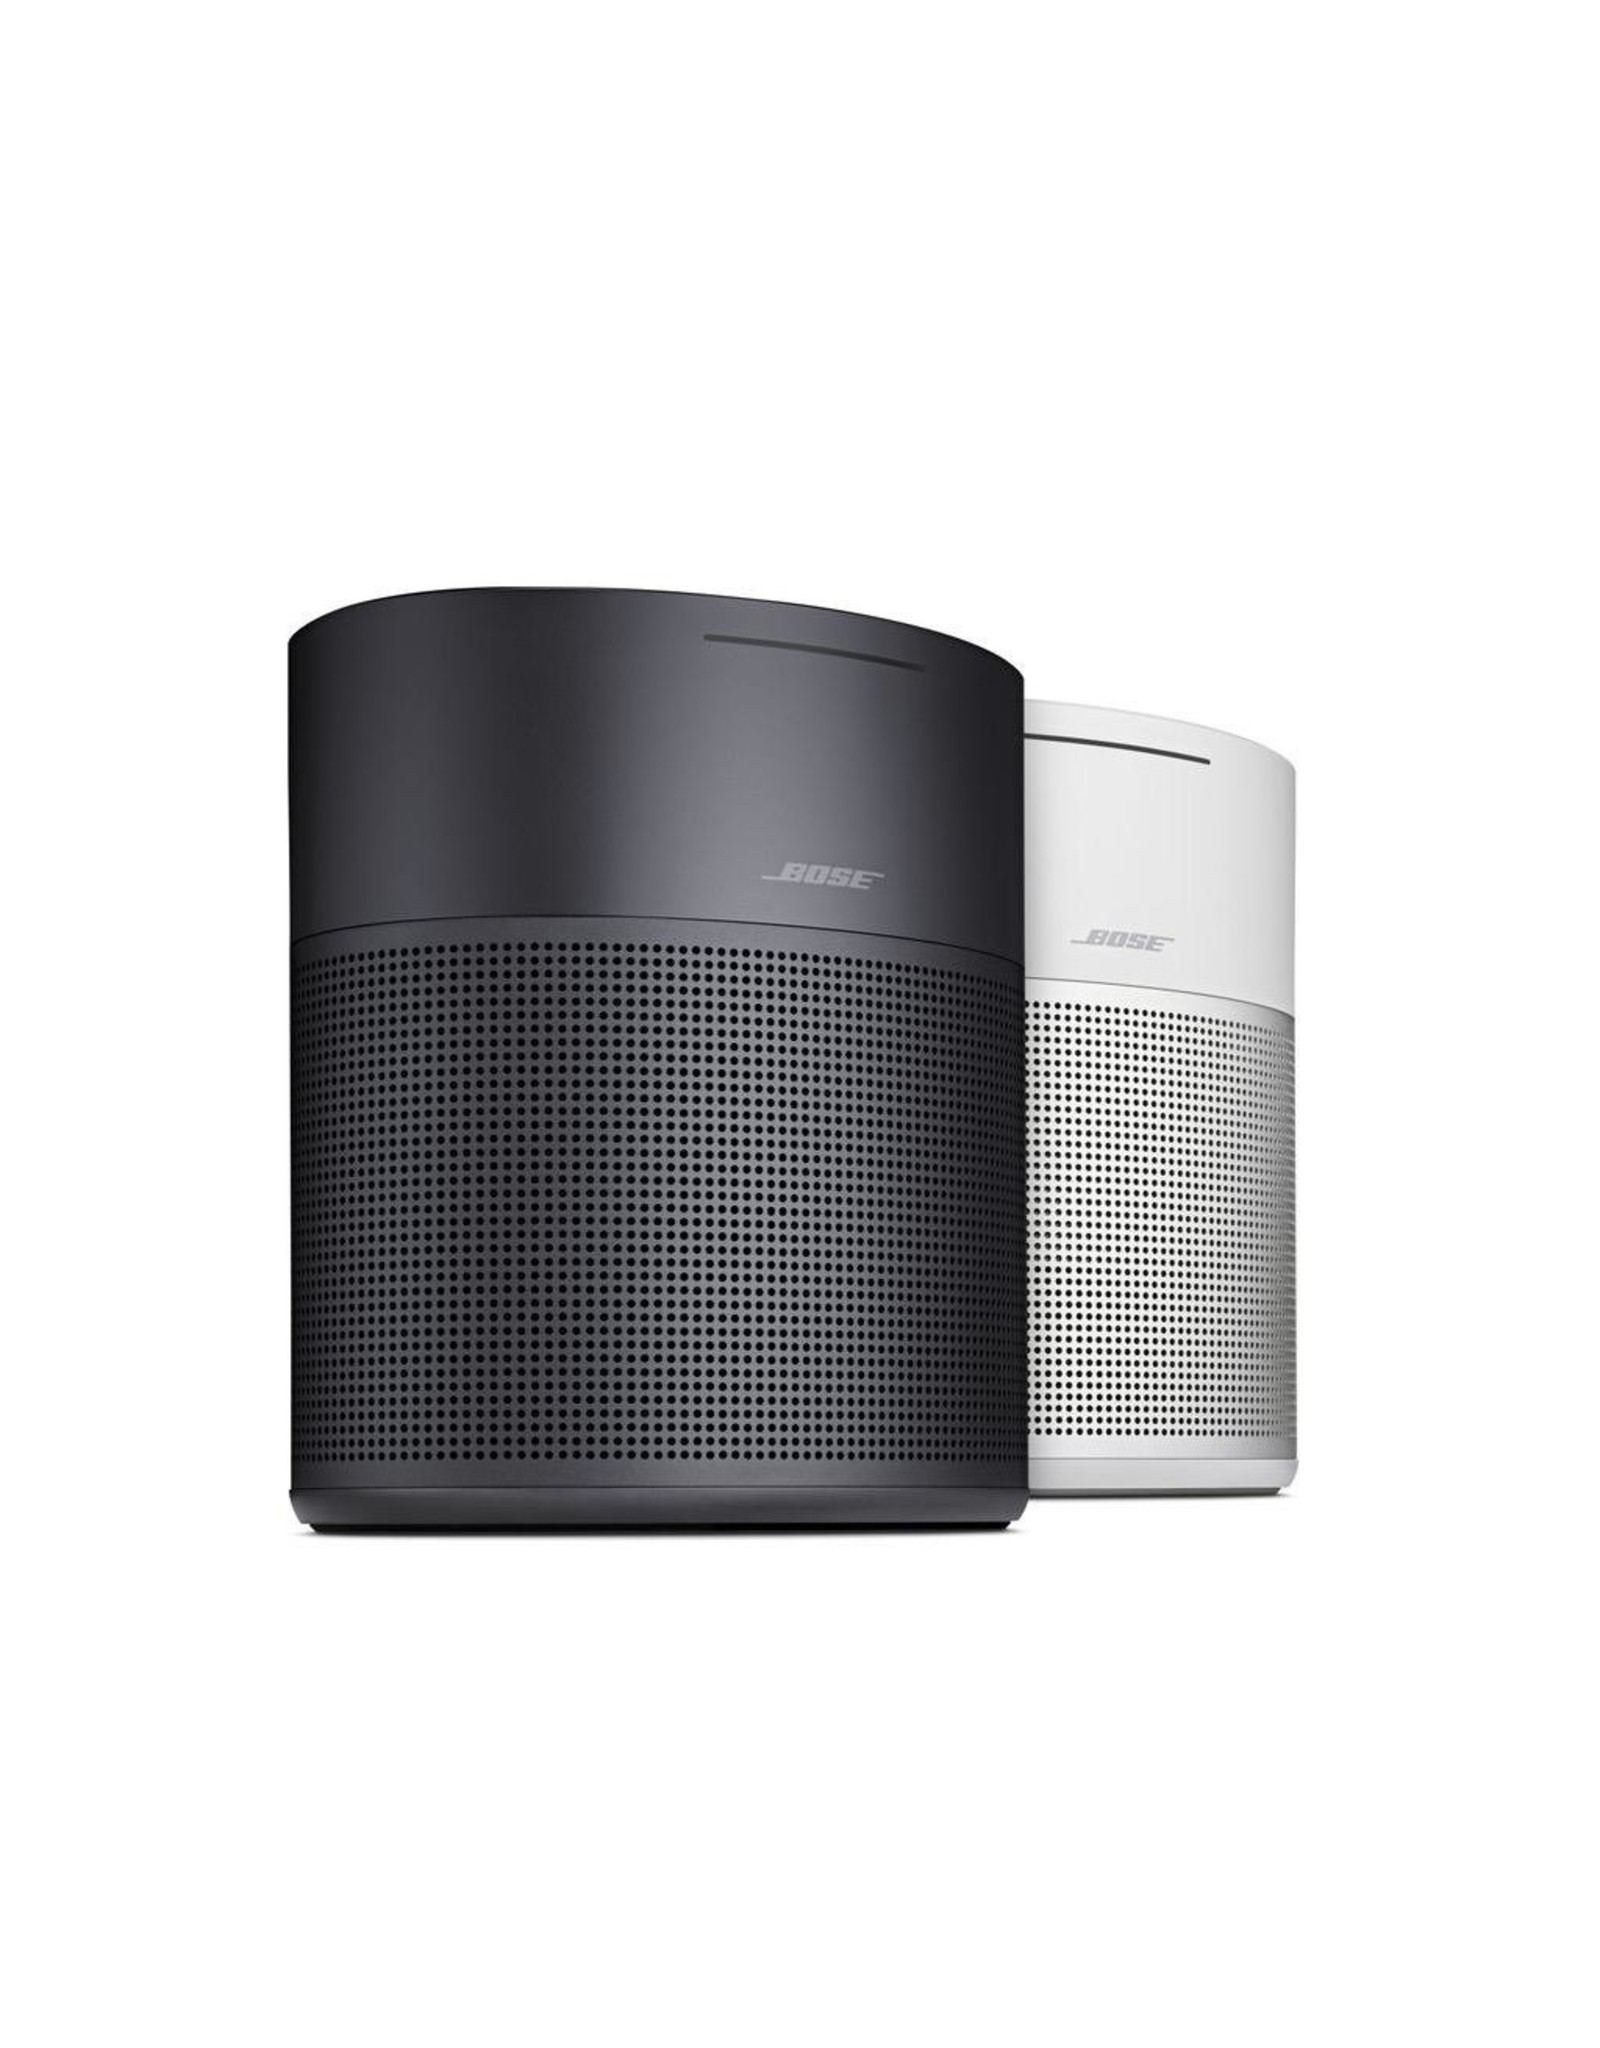 BOSE BOSE Home Speaker 300